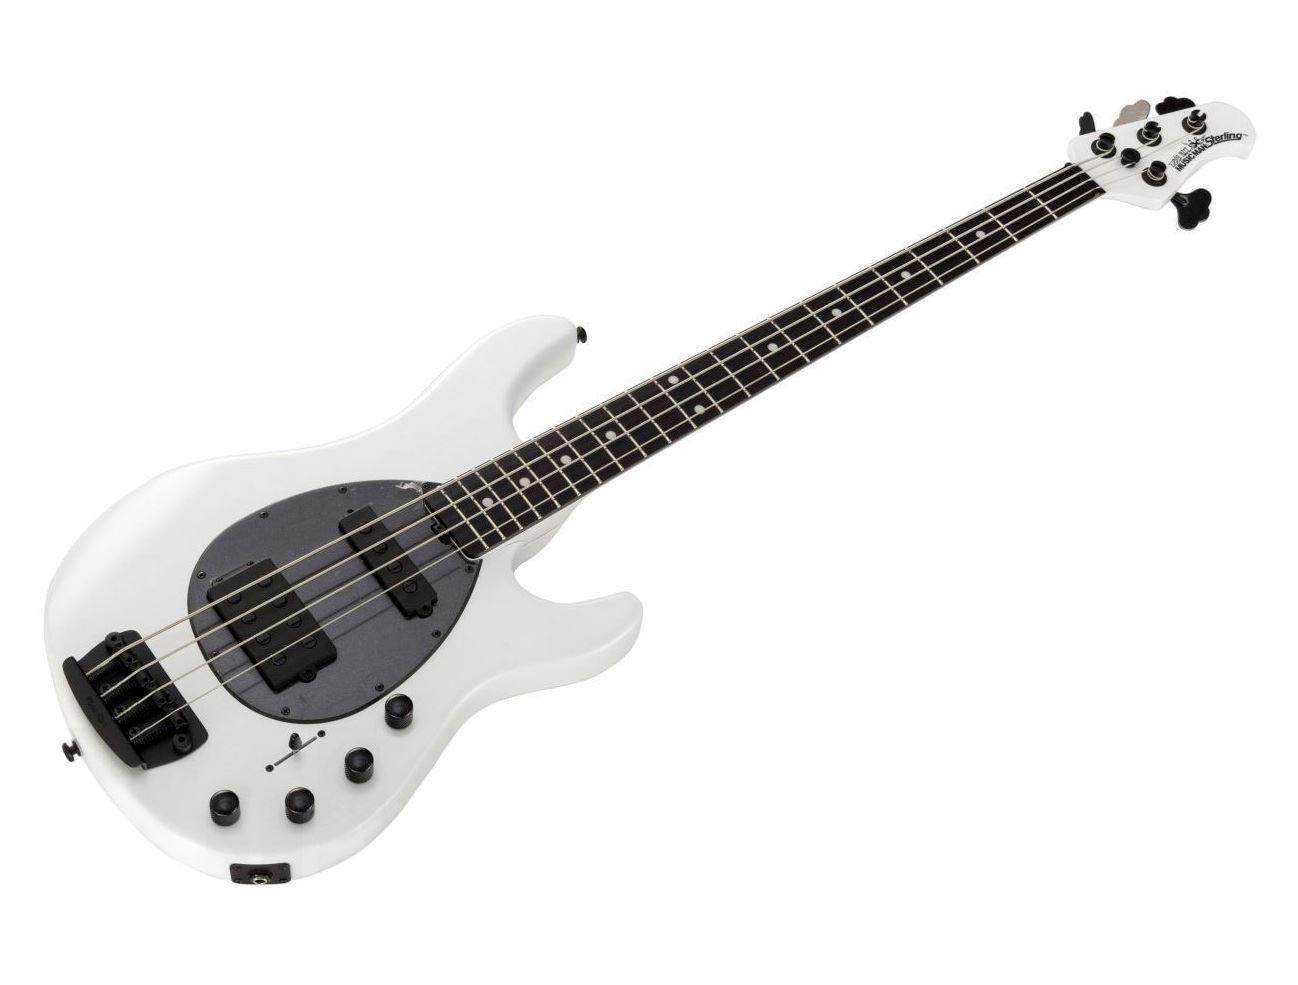 ernie ball music man stingray 4 bass guitar ebony fretboard black hardware stealth pearl white. Black Bedroom Furniture Sets. Home Design Ideas